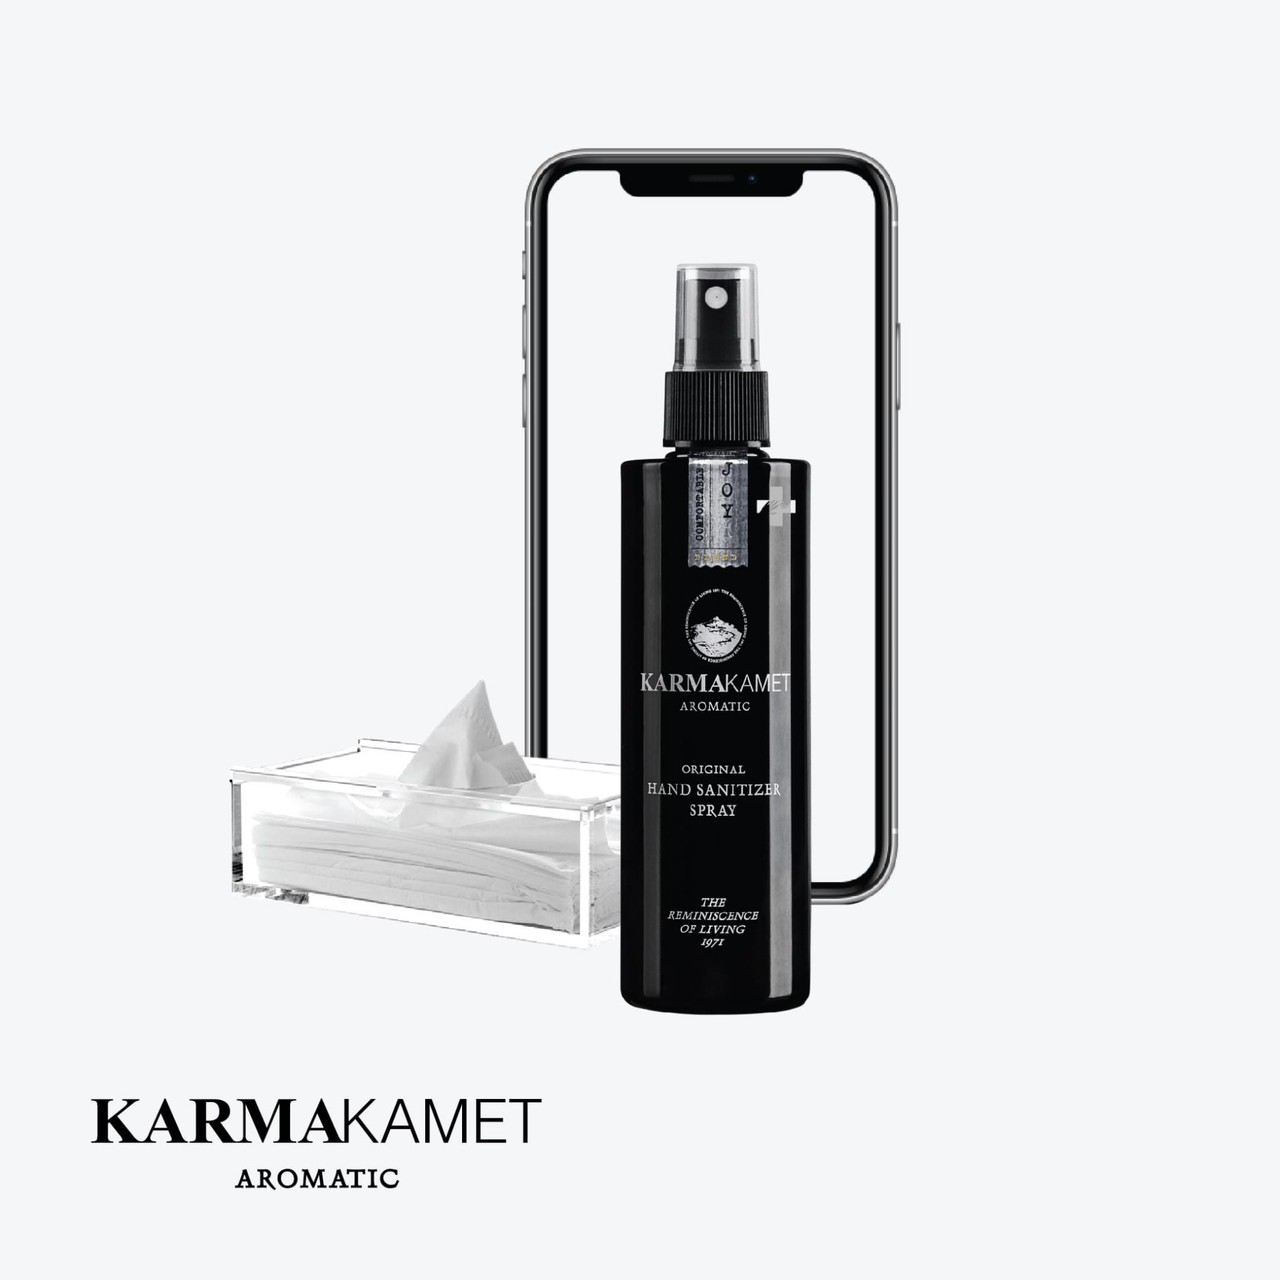 Karmakamet Original Hand Sanitizer Spray สเปรย์ฆ่าเชื้อโรค